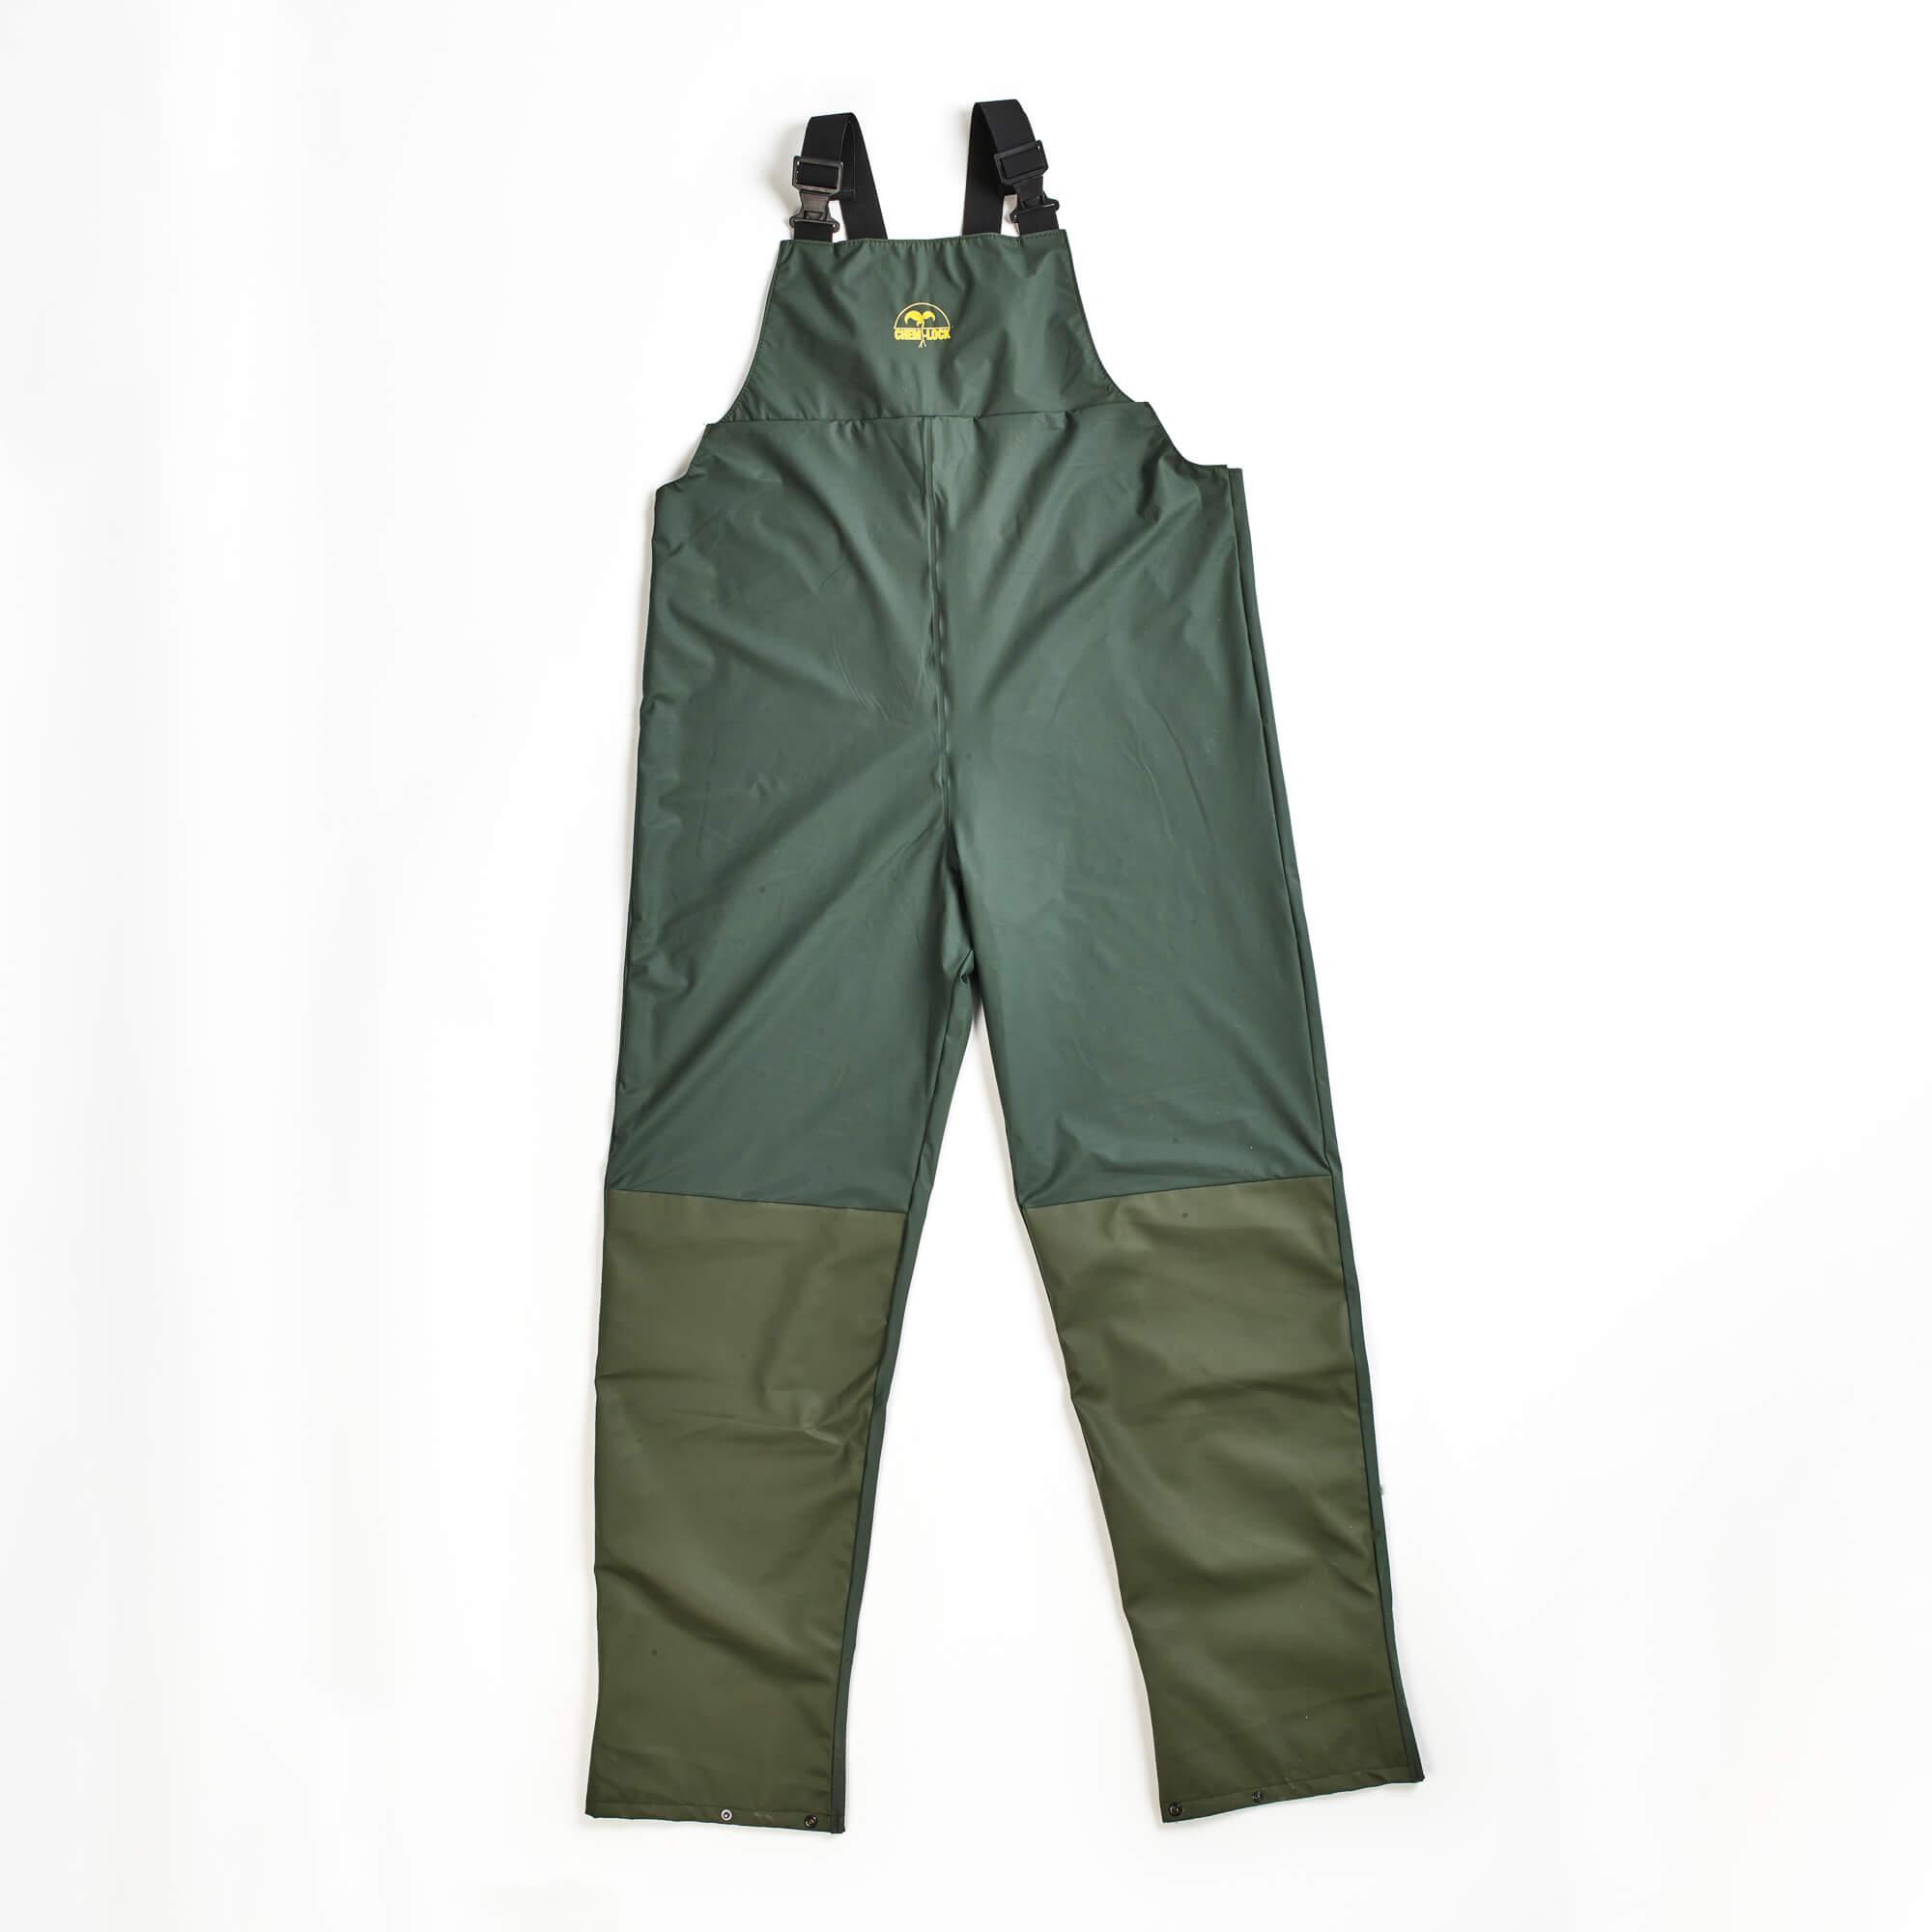 Chem-Lock® Forestry/Amenity 2 Piece Type 4 Spray Suit